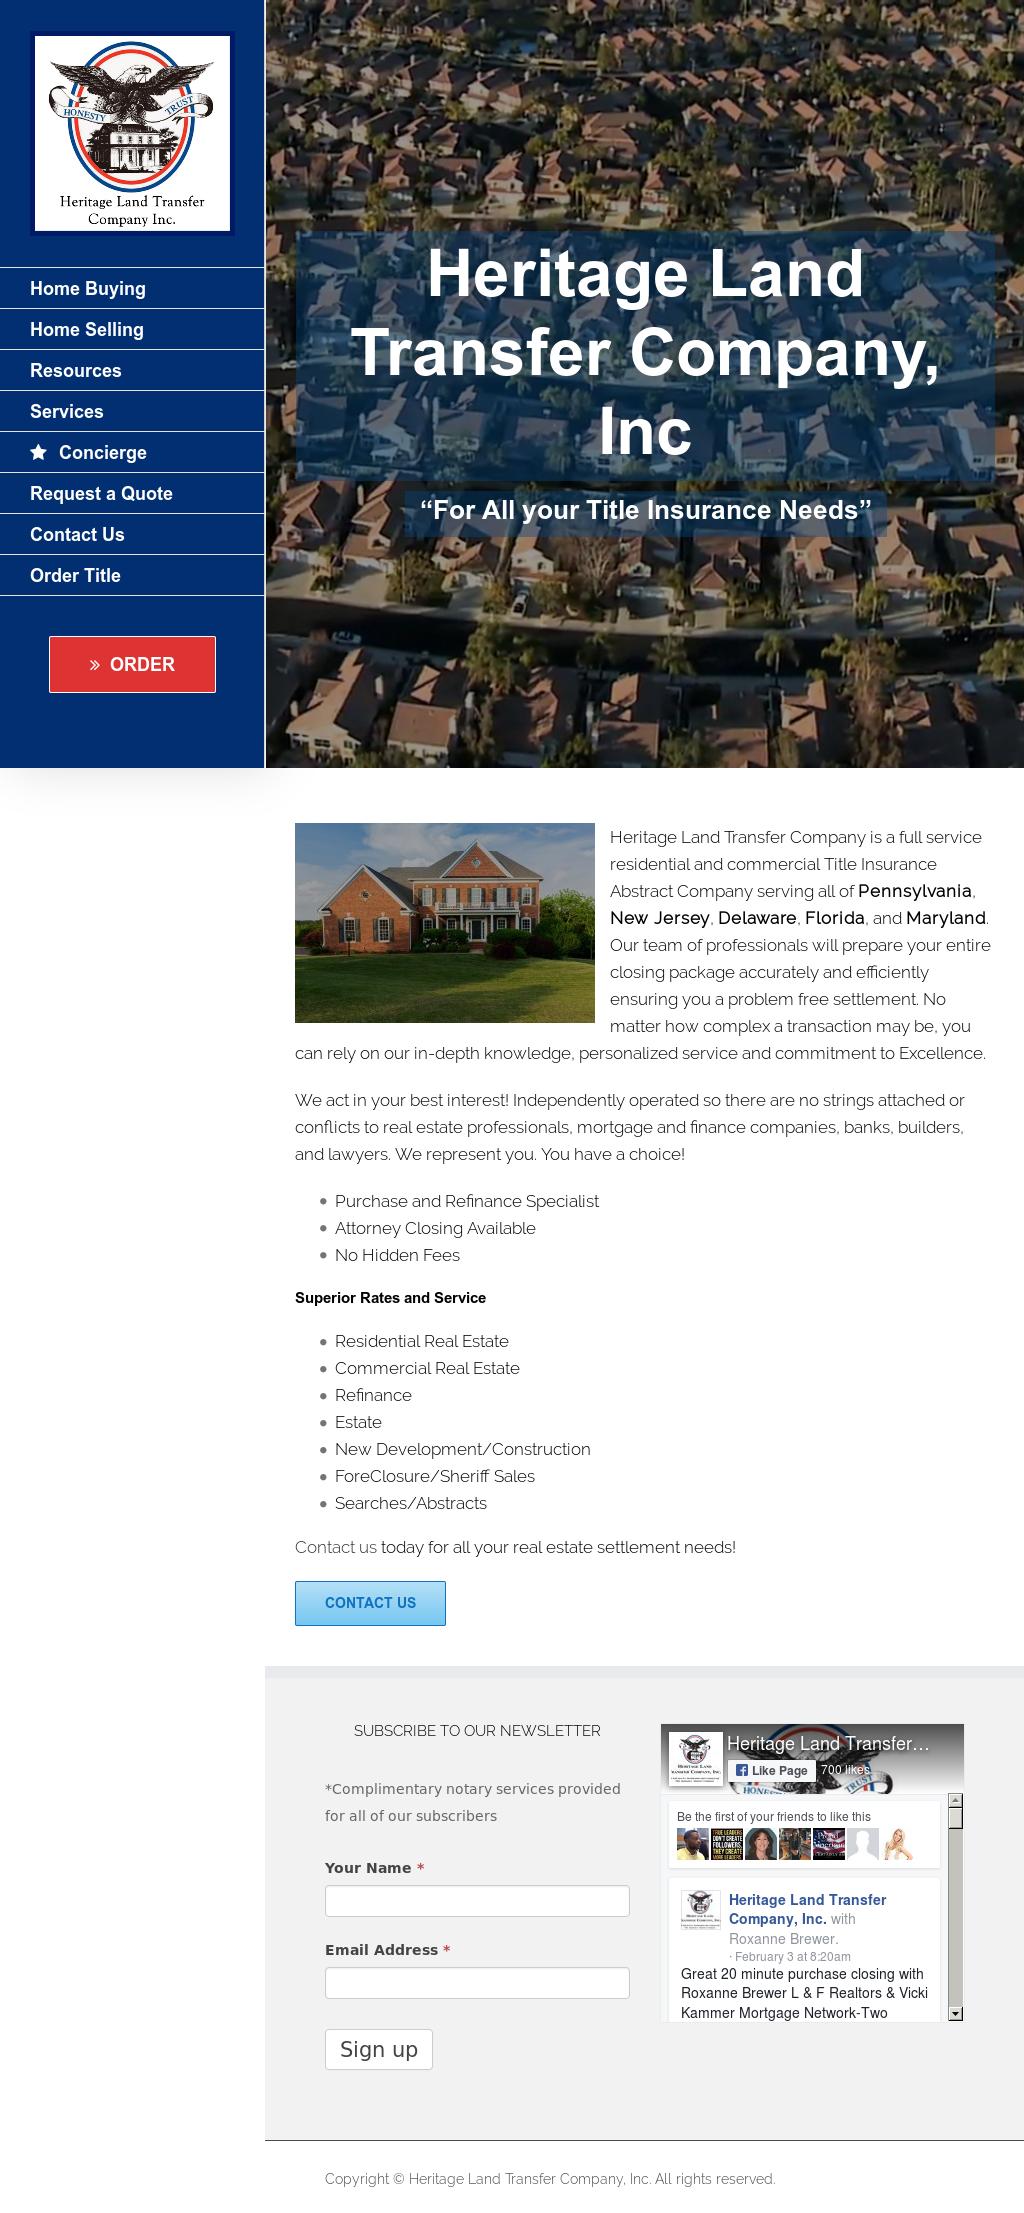 Heritage Land Transfer Company Competitors, Revenue and